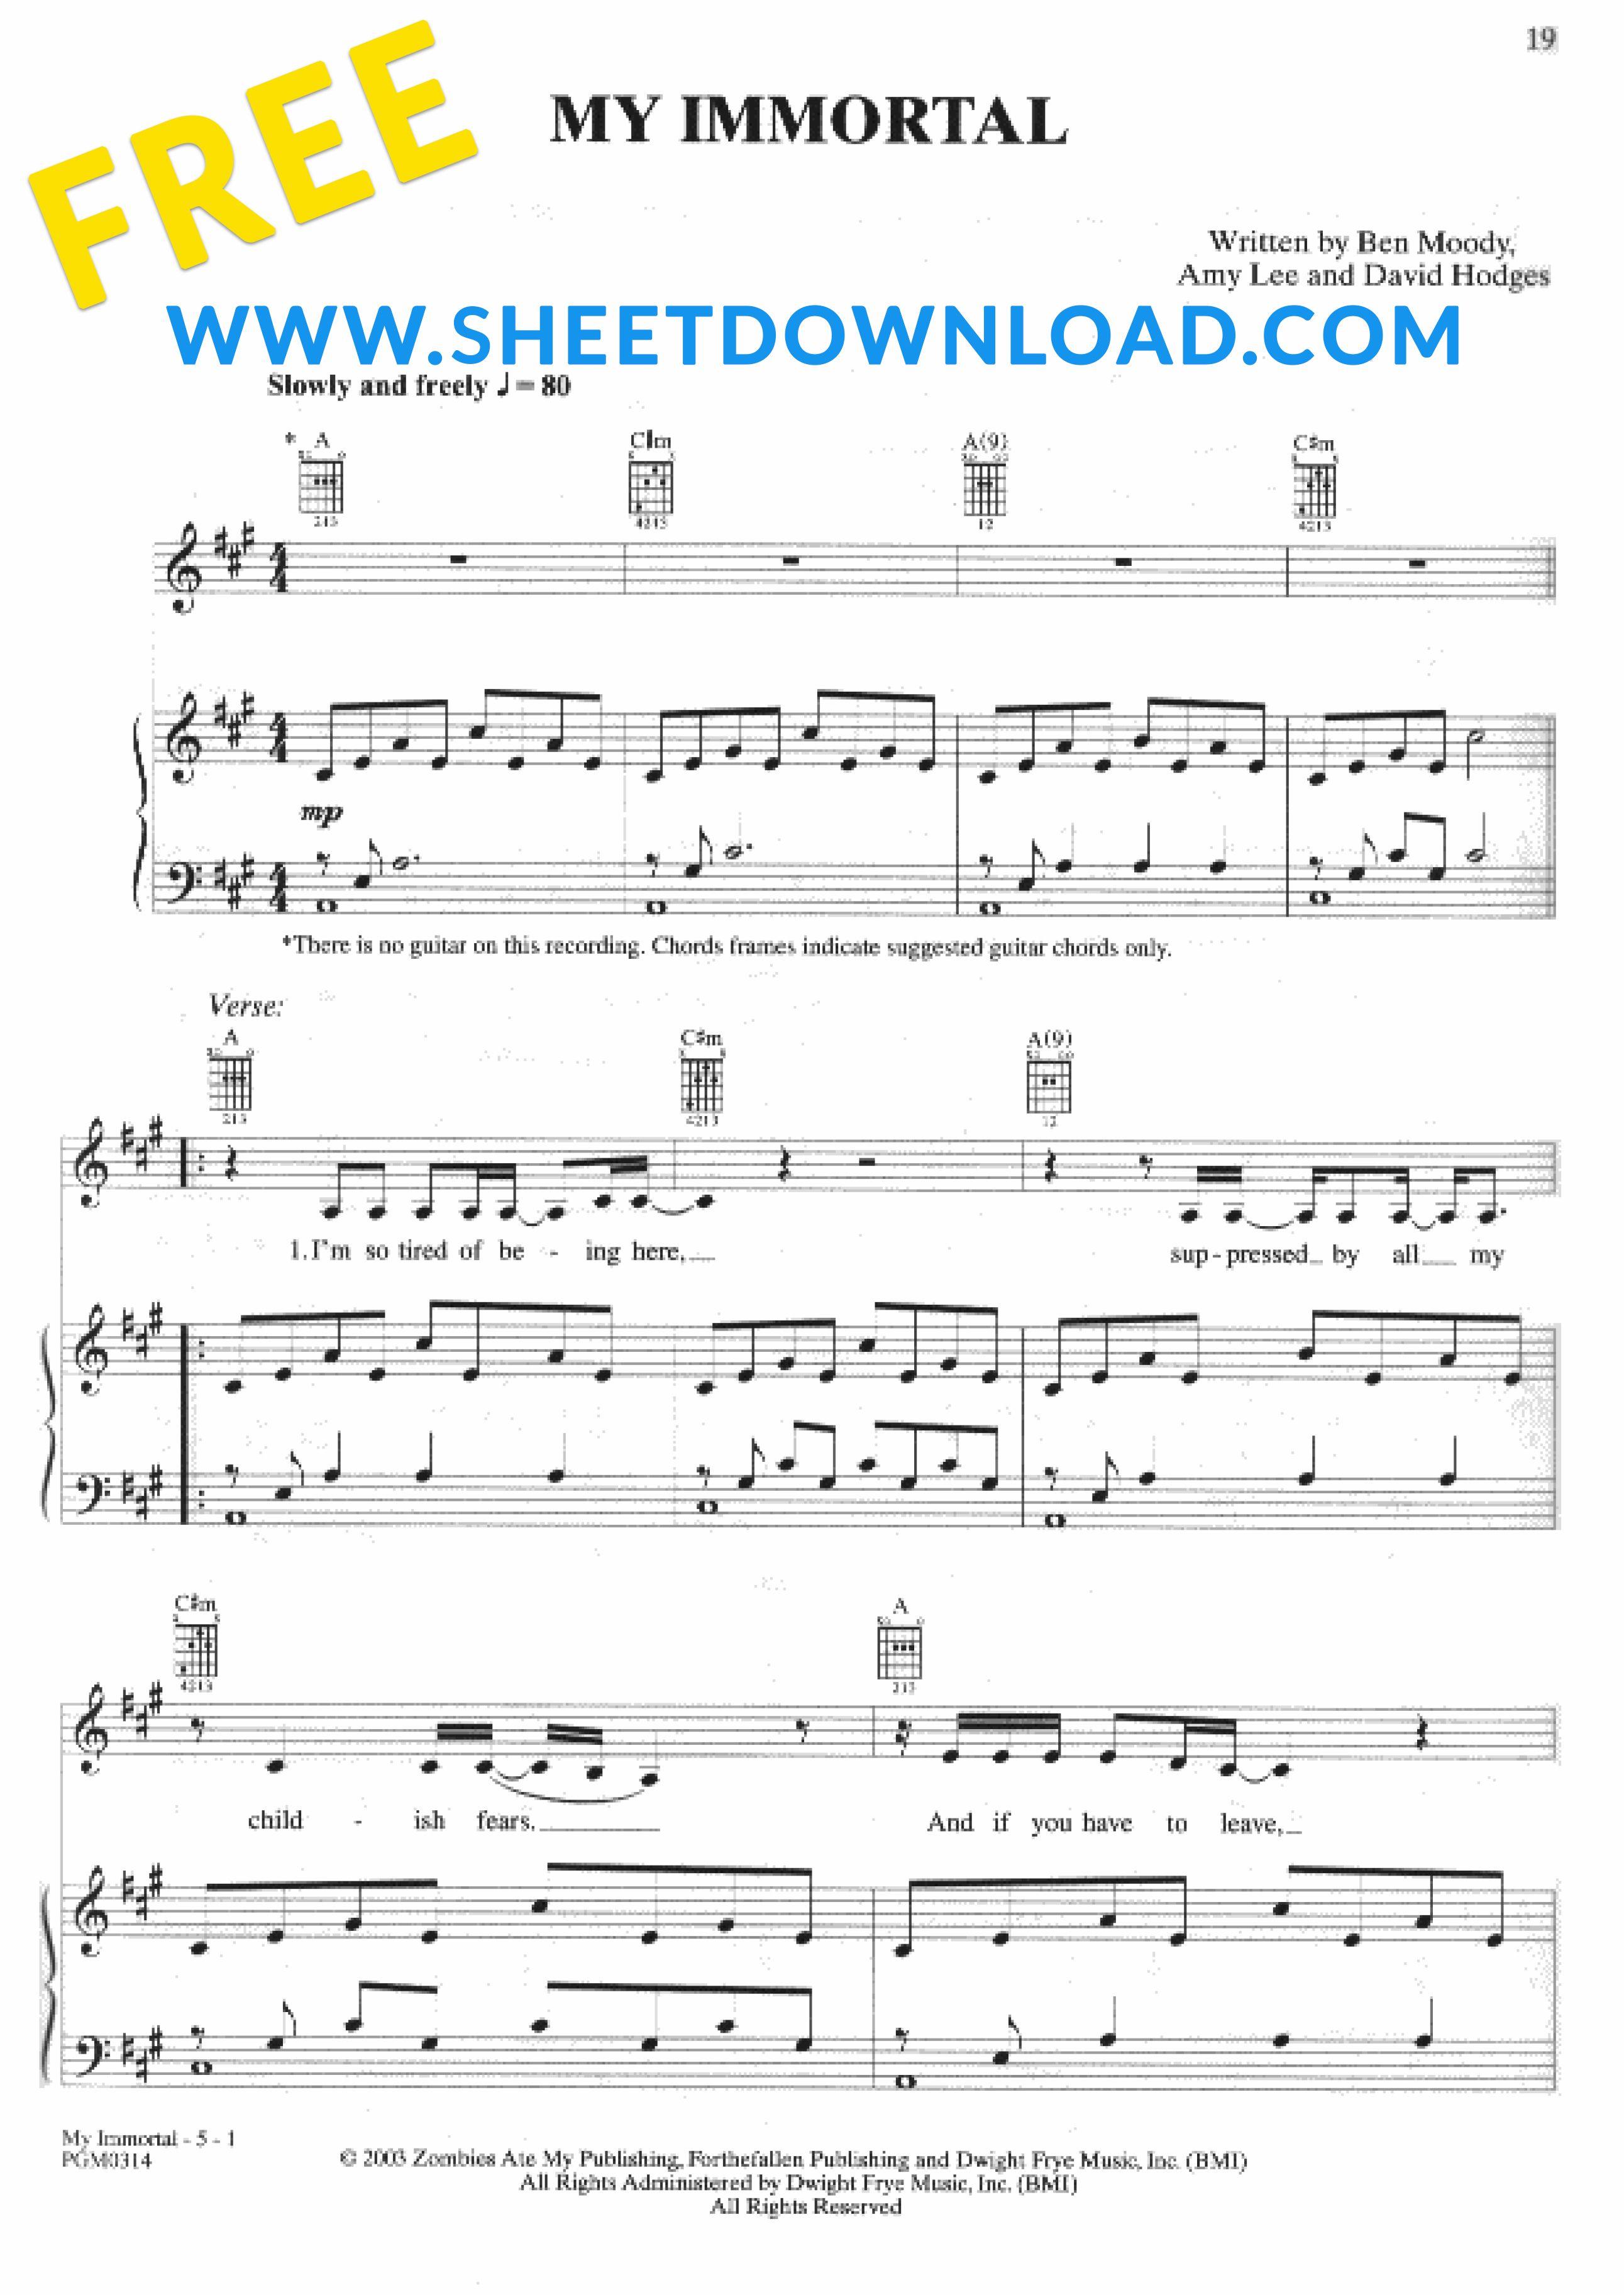 Download And Print My Immortal Piano Sheet Music 100 Free